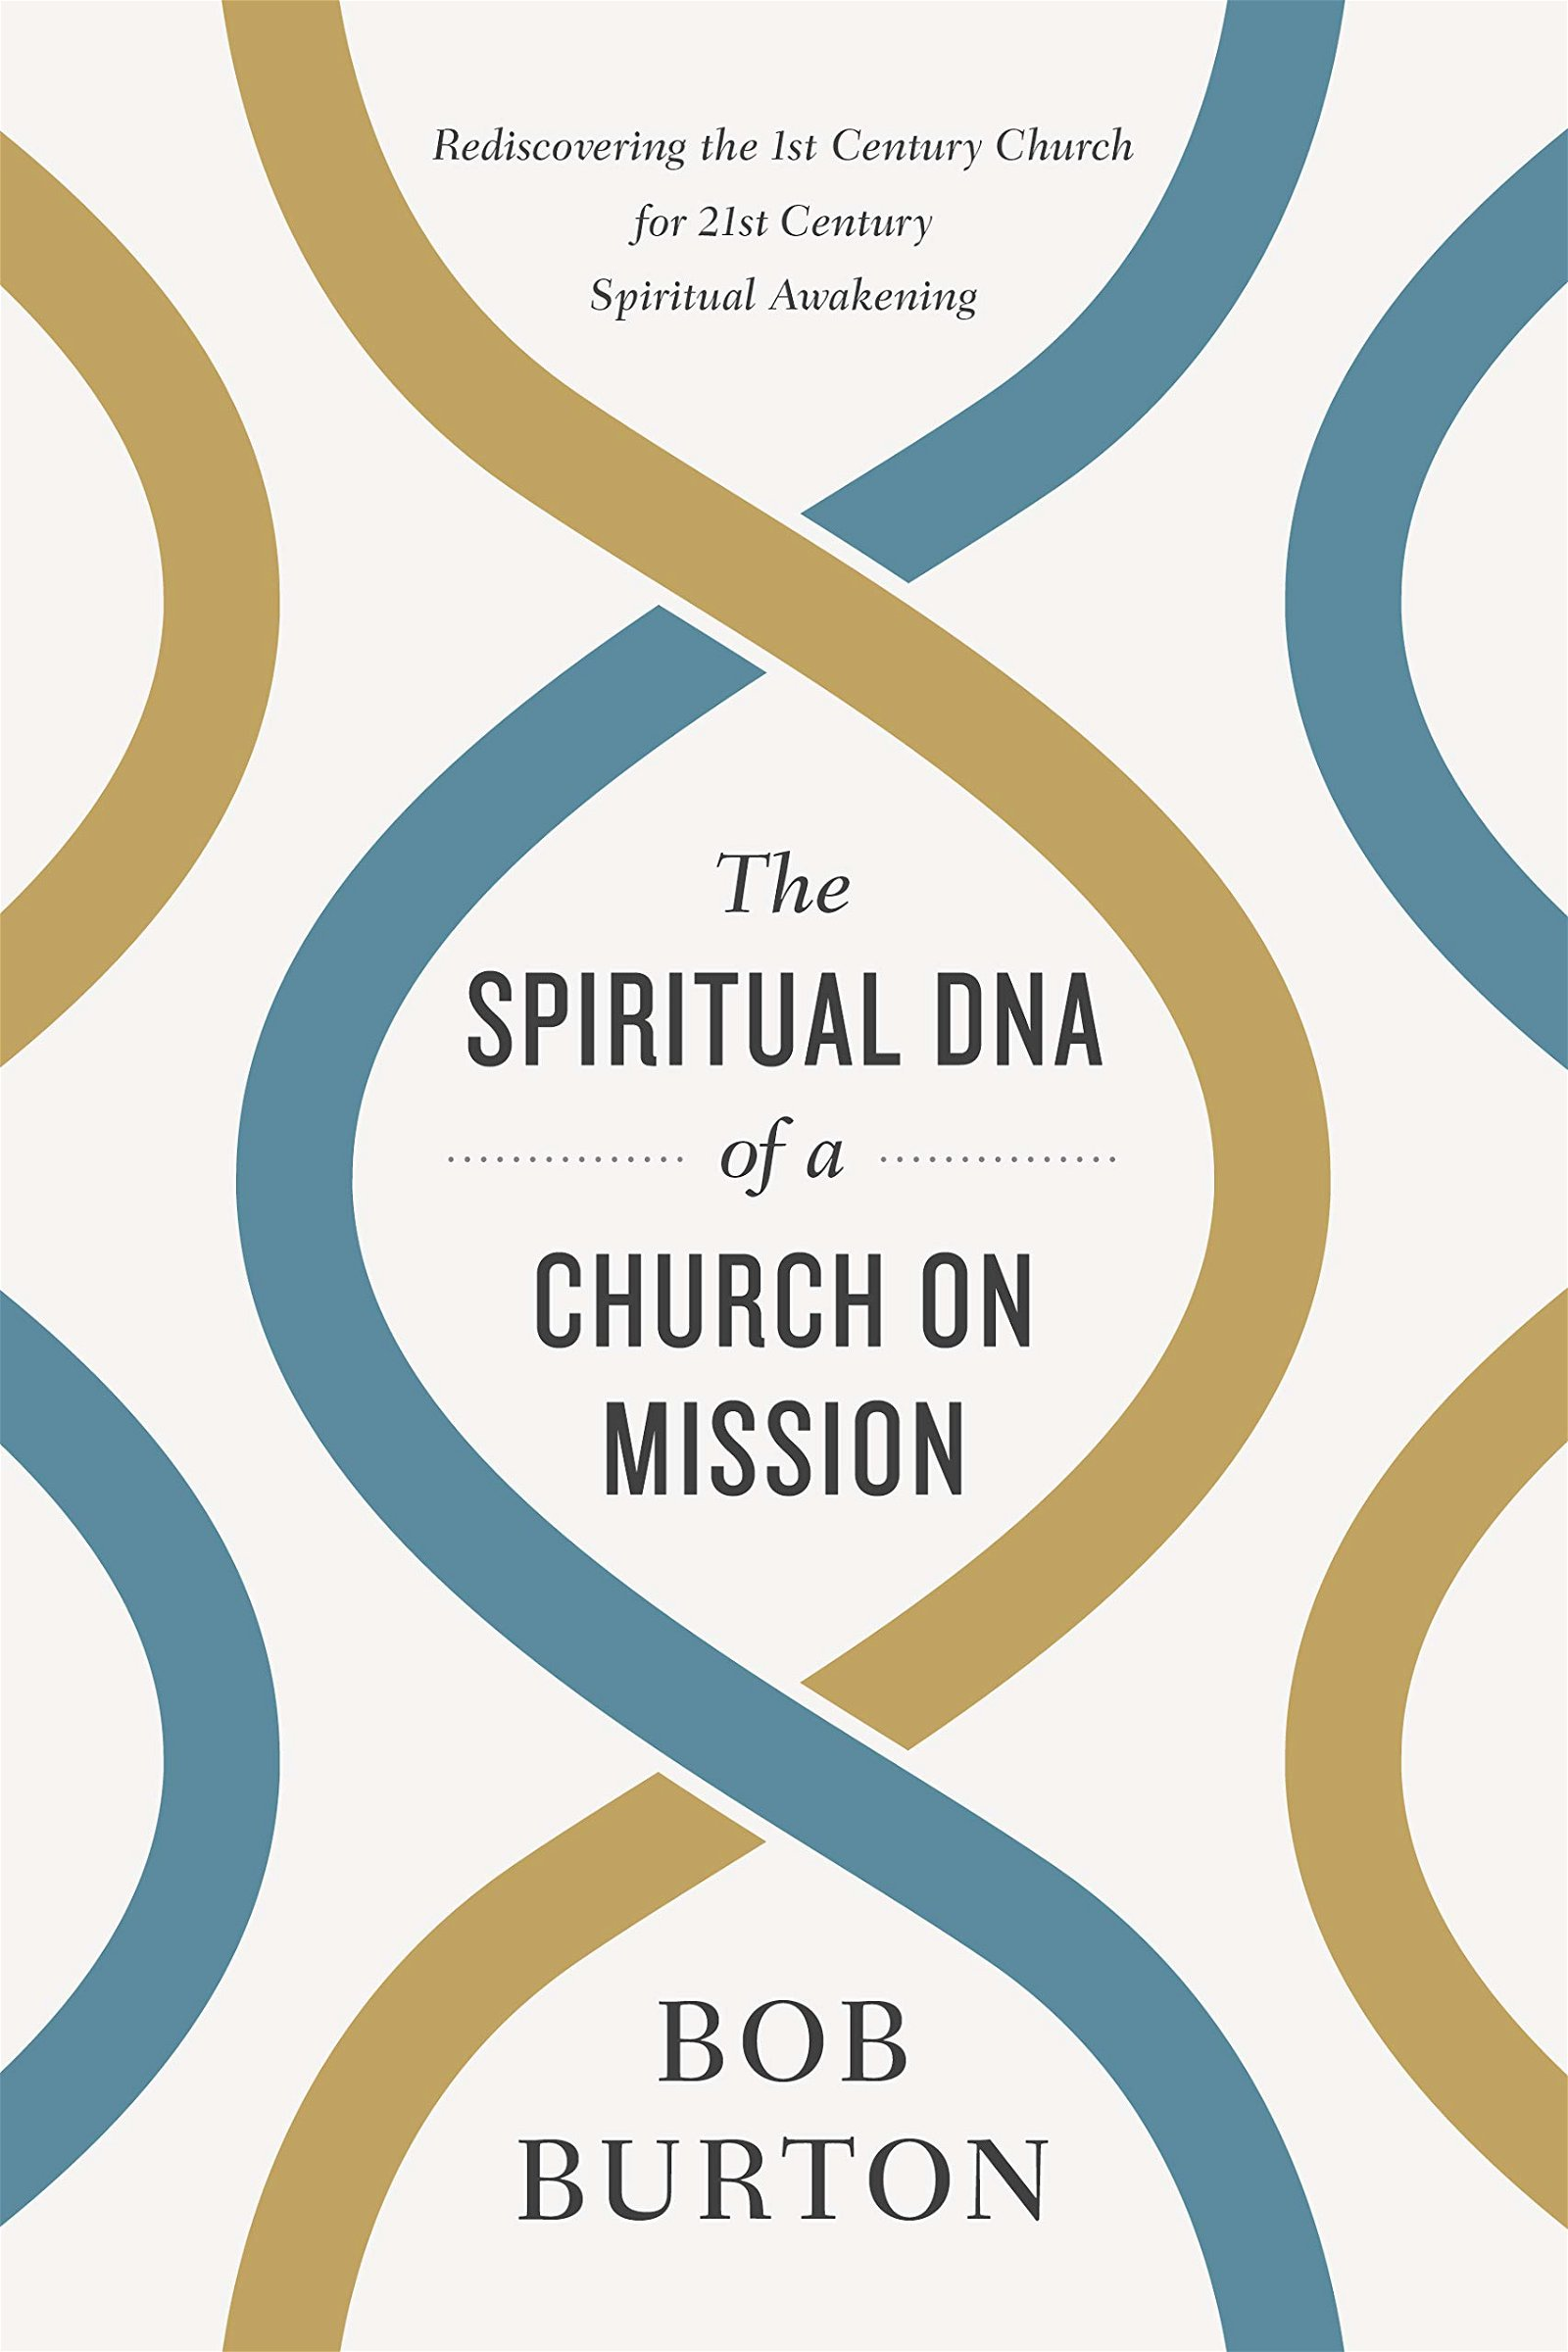 Bob Burton- The Spiritual DNA of a Church on Mission